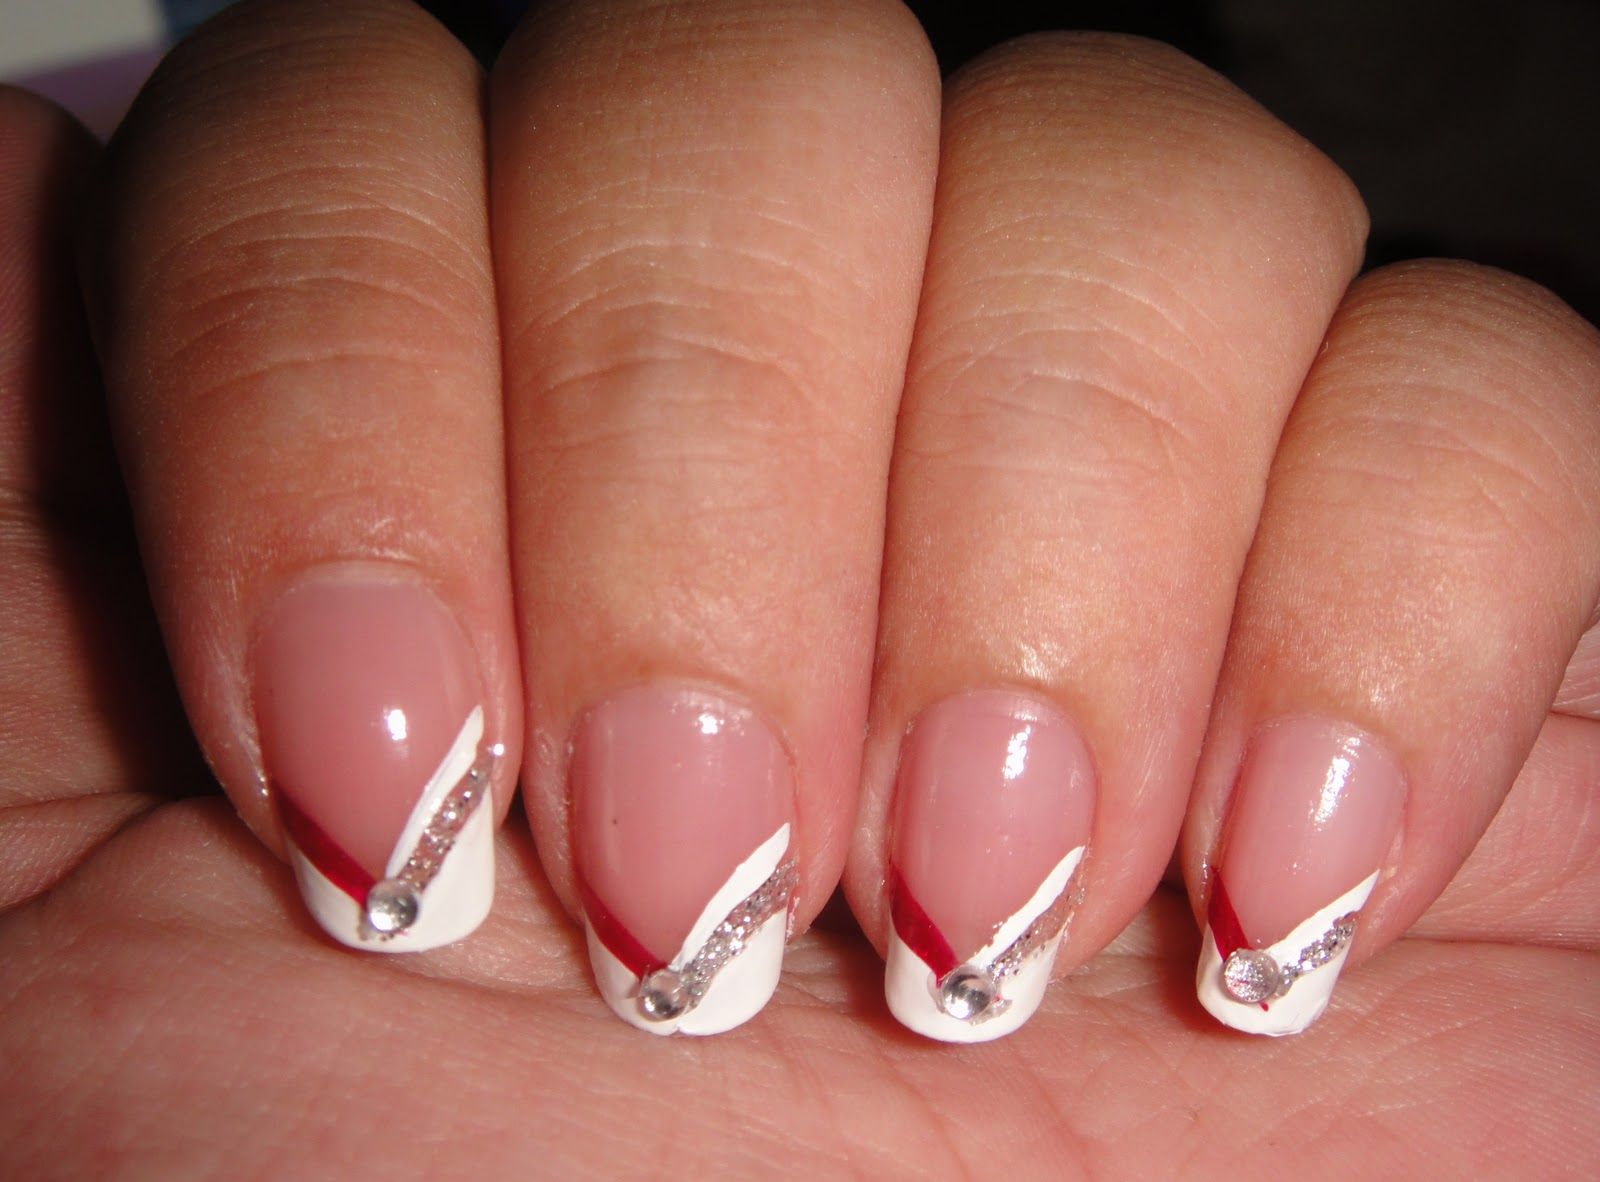 Colored french nail design - Fall Nail Art Designs Chevron French Plus Fall Nail